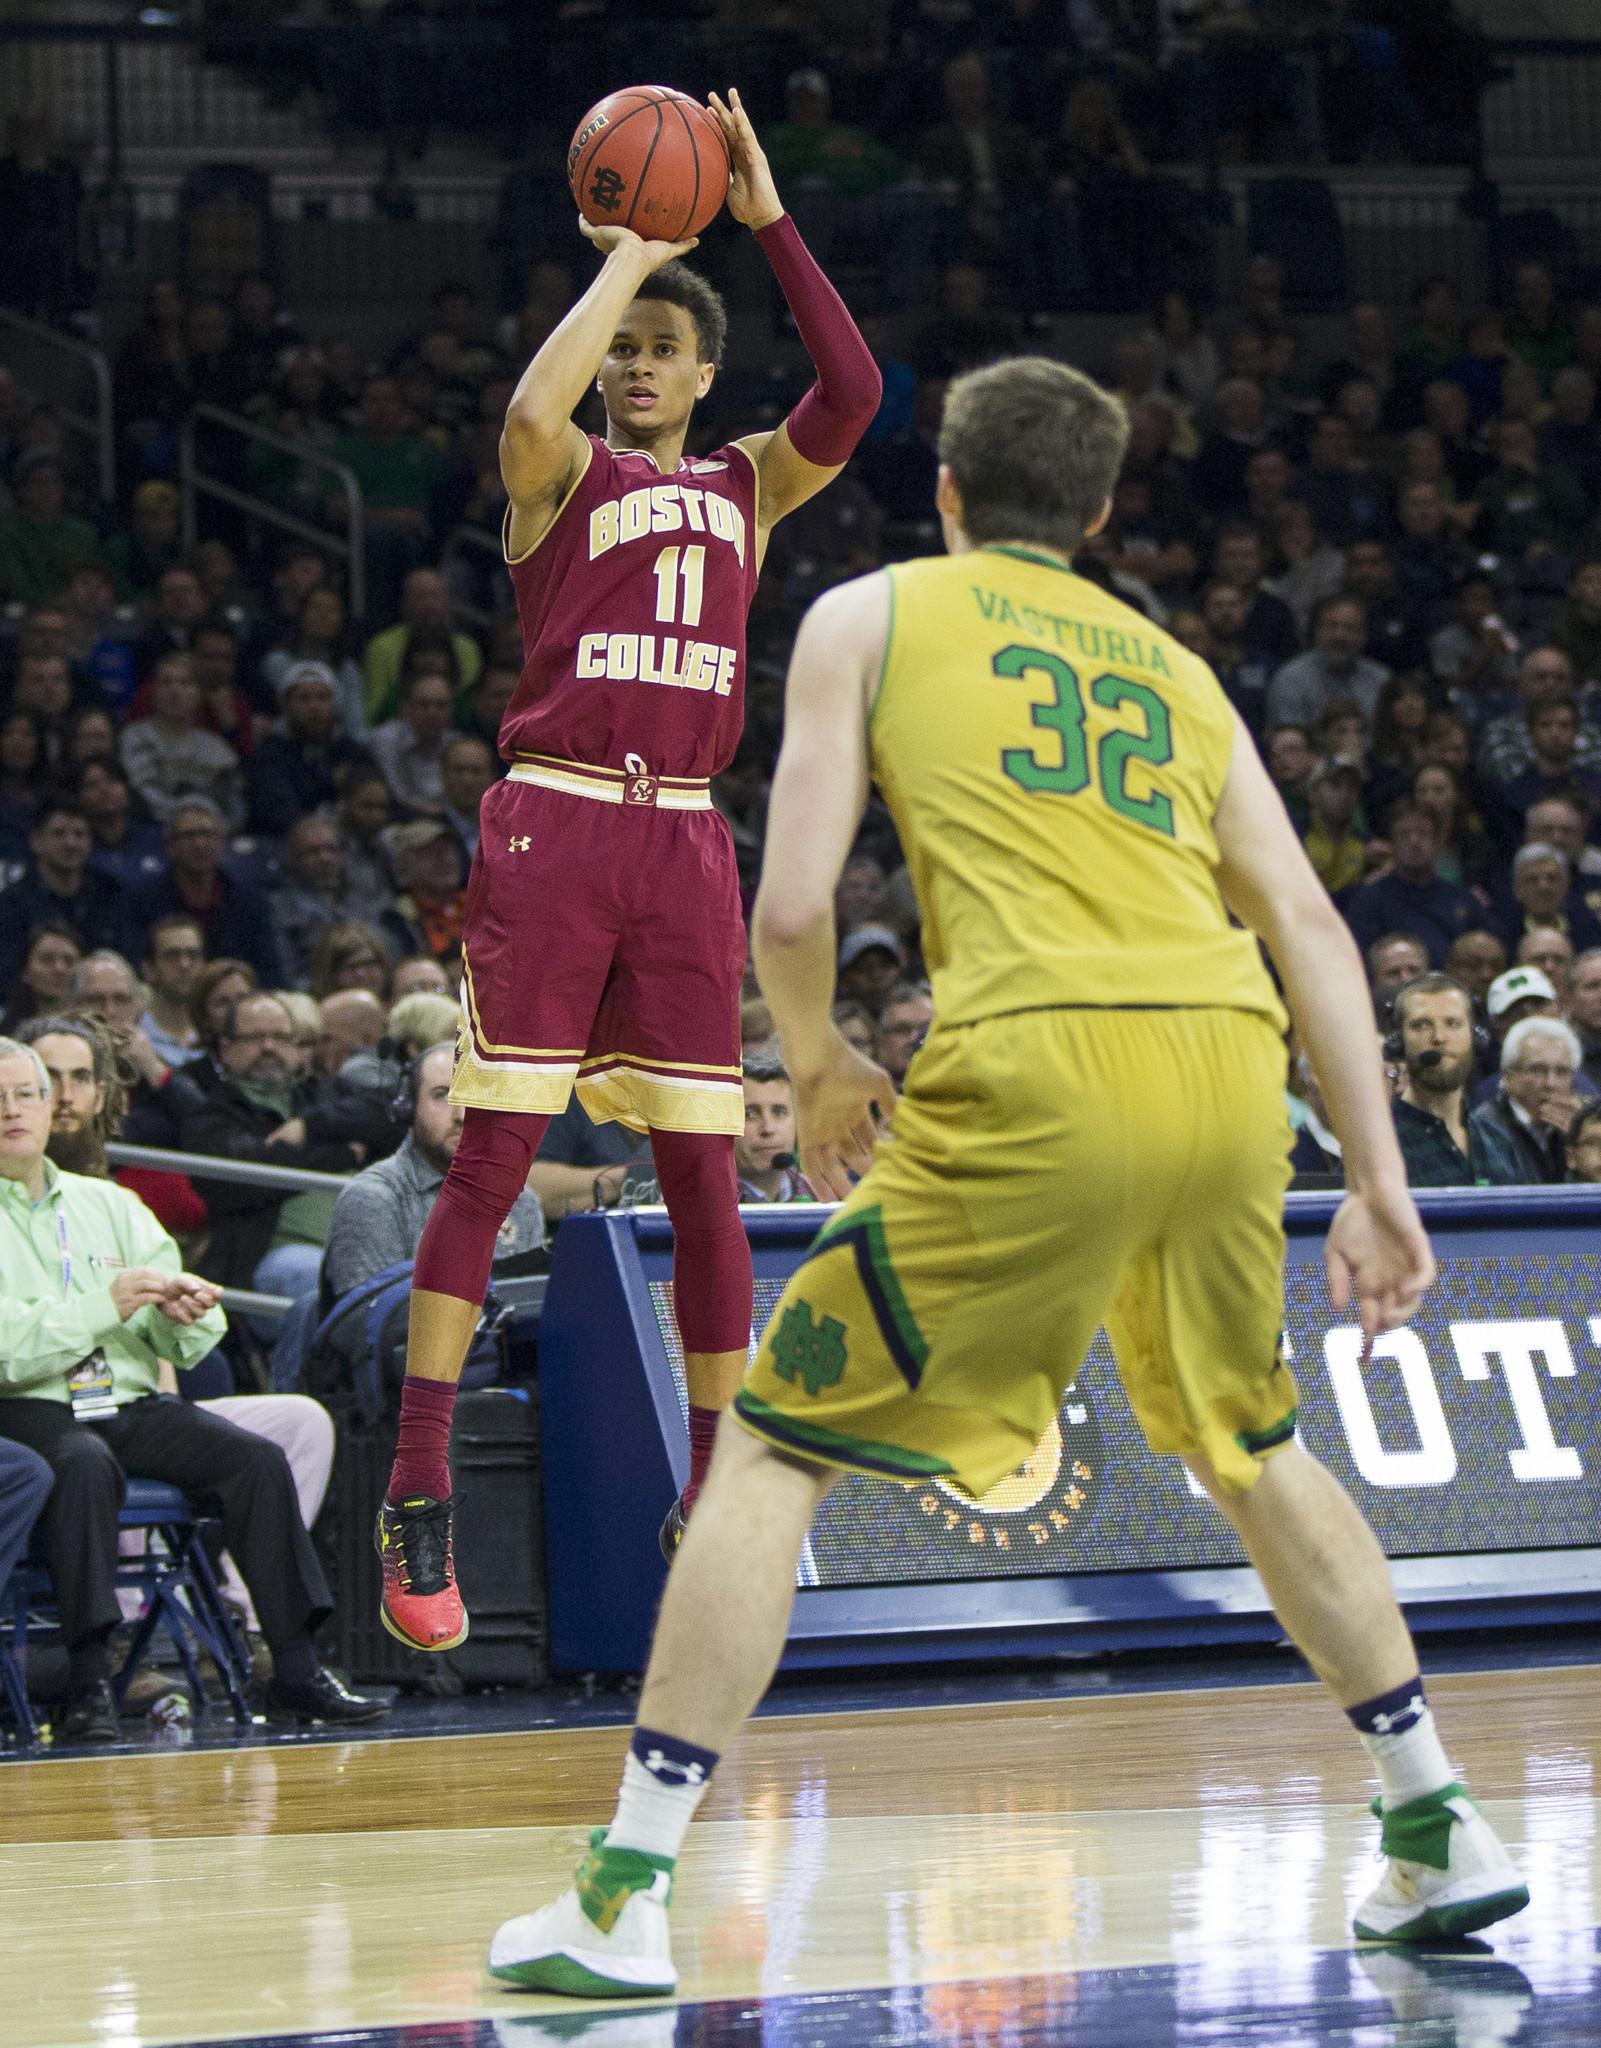 Ct-aj-young-northwestern-basketball-transfer-20170427